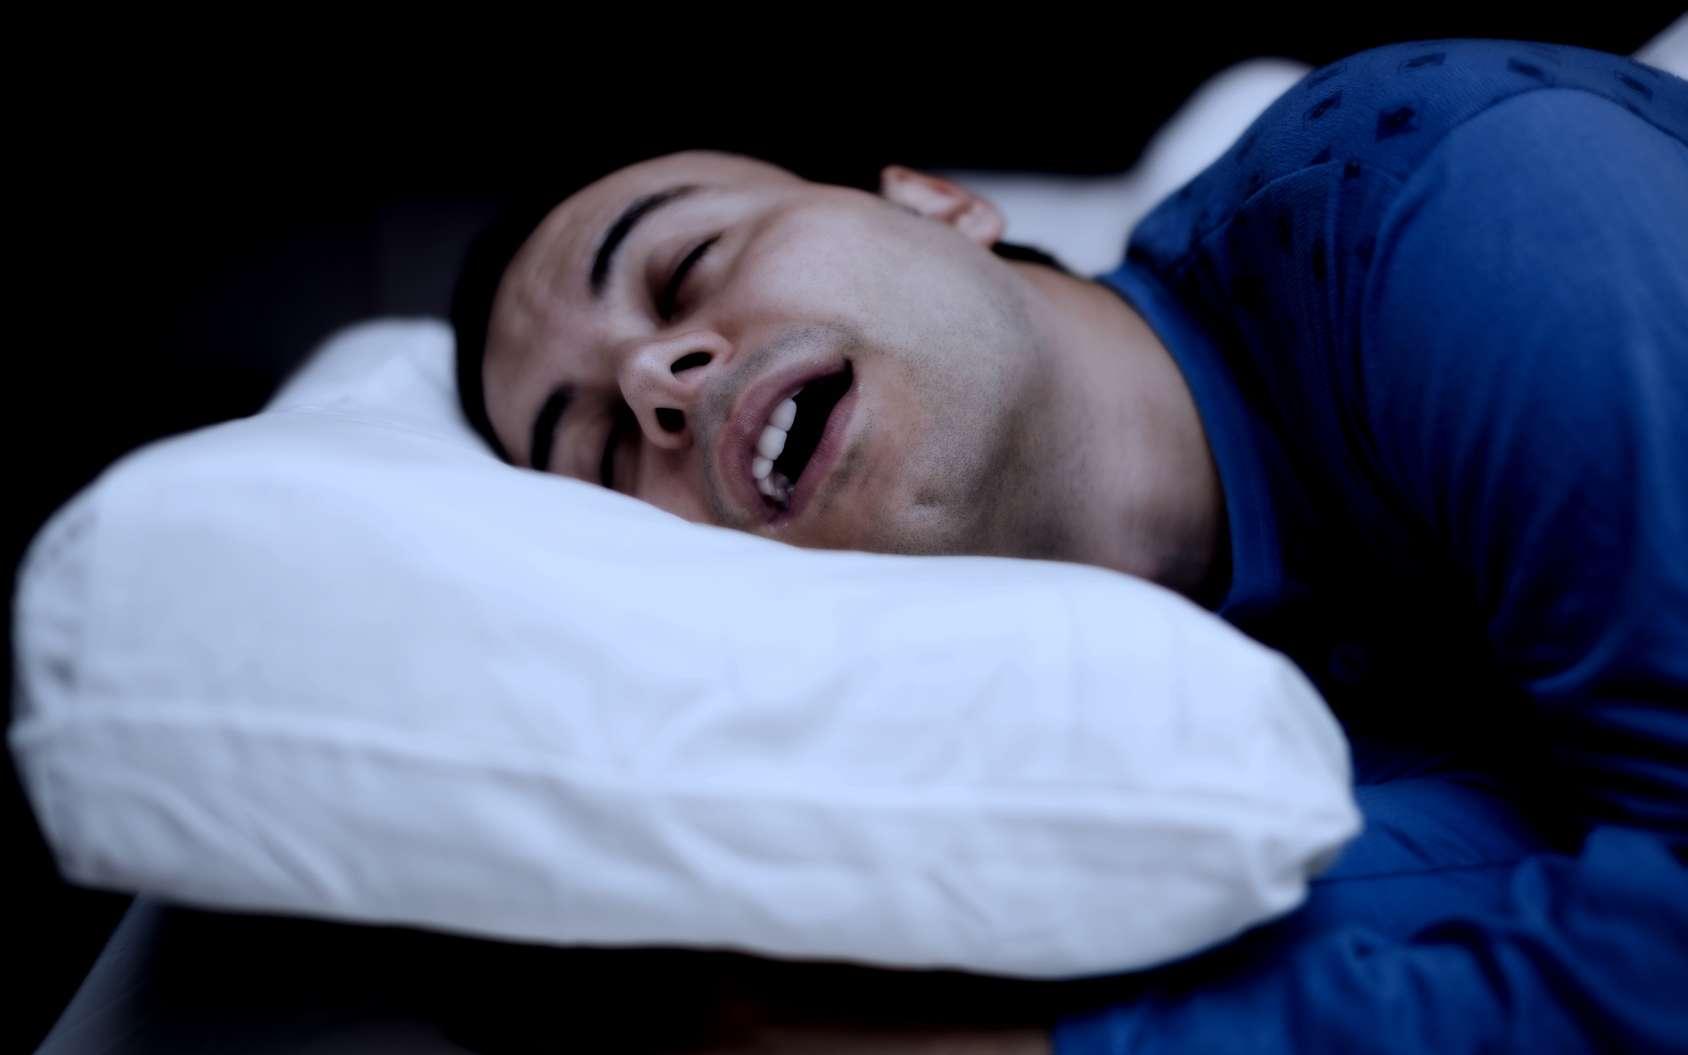 Bien dormir, c'est une nécessité. © Minerva Studio, Fotolia